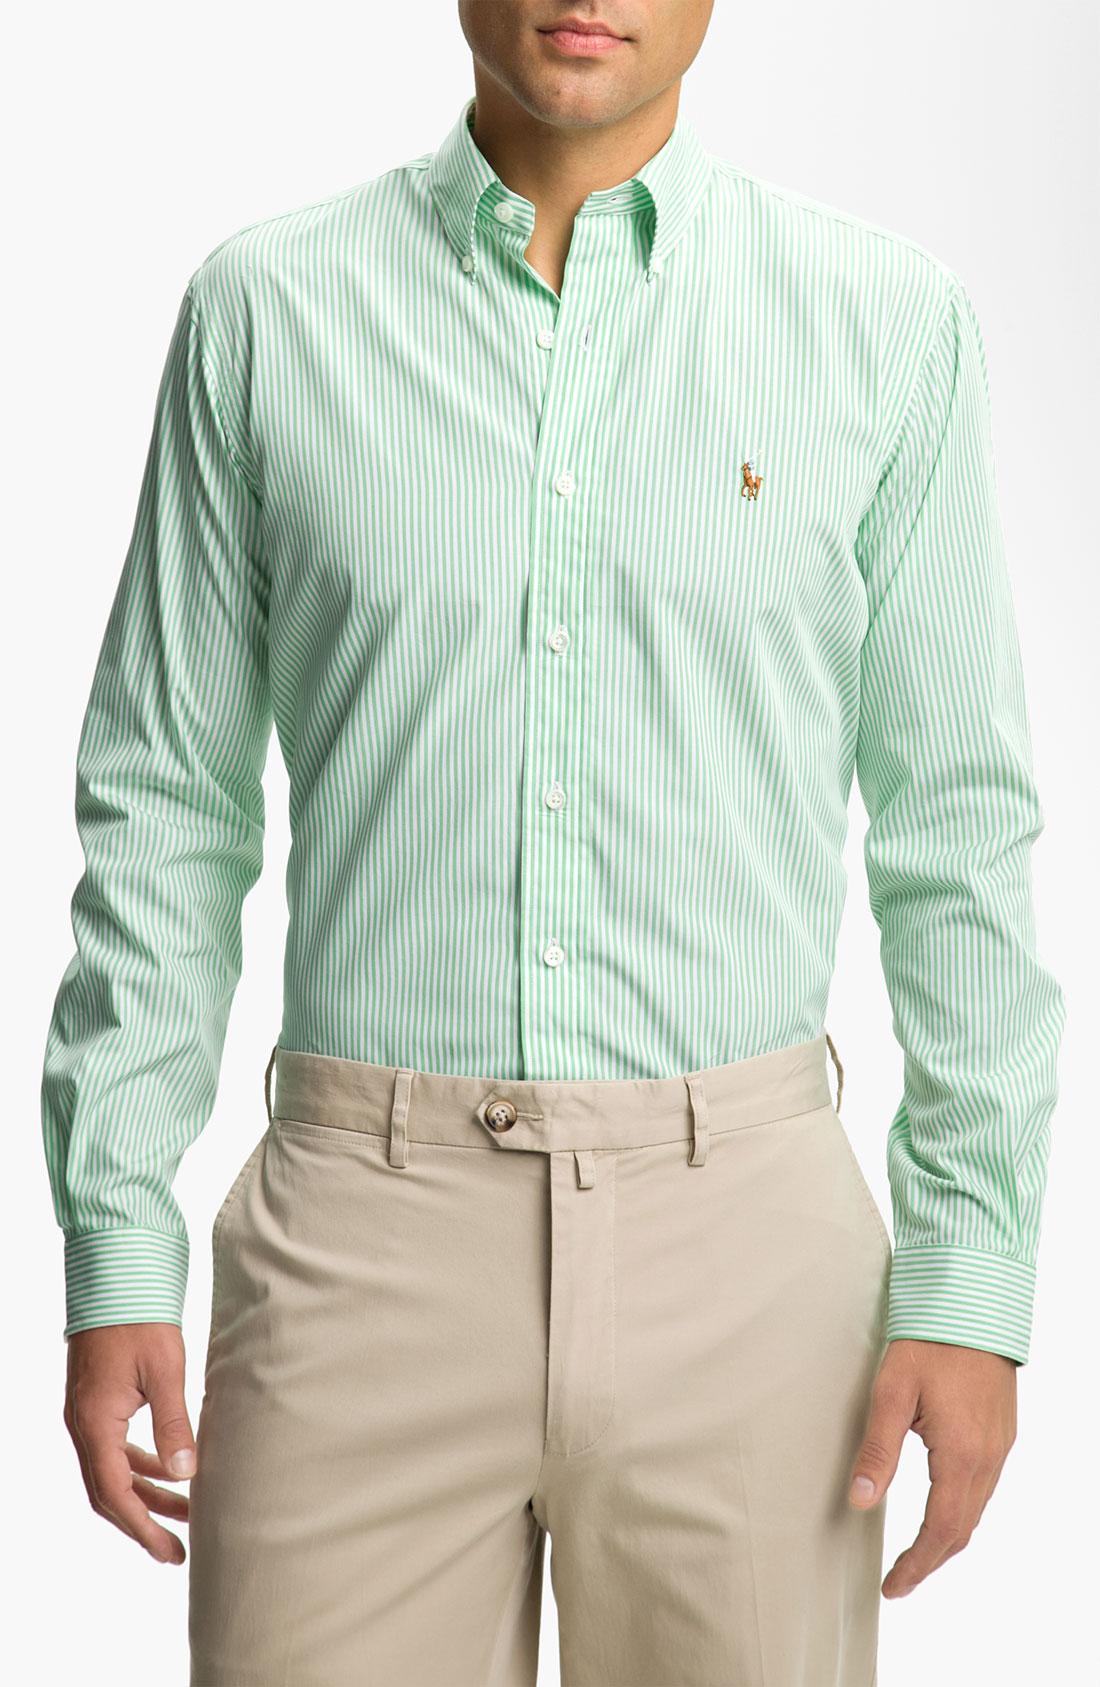 polo ralph lauren stripe sport shirt in green for men. Black Bedroom Furniture Sets. Home Design Ideas